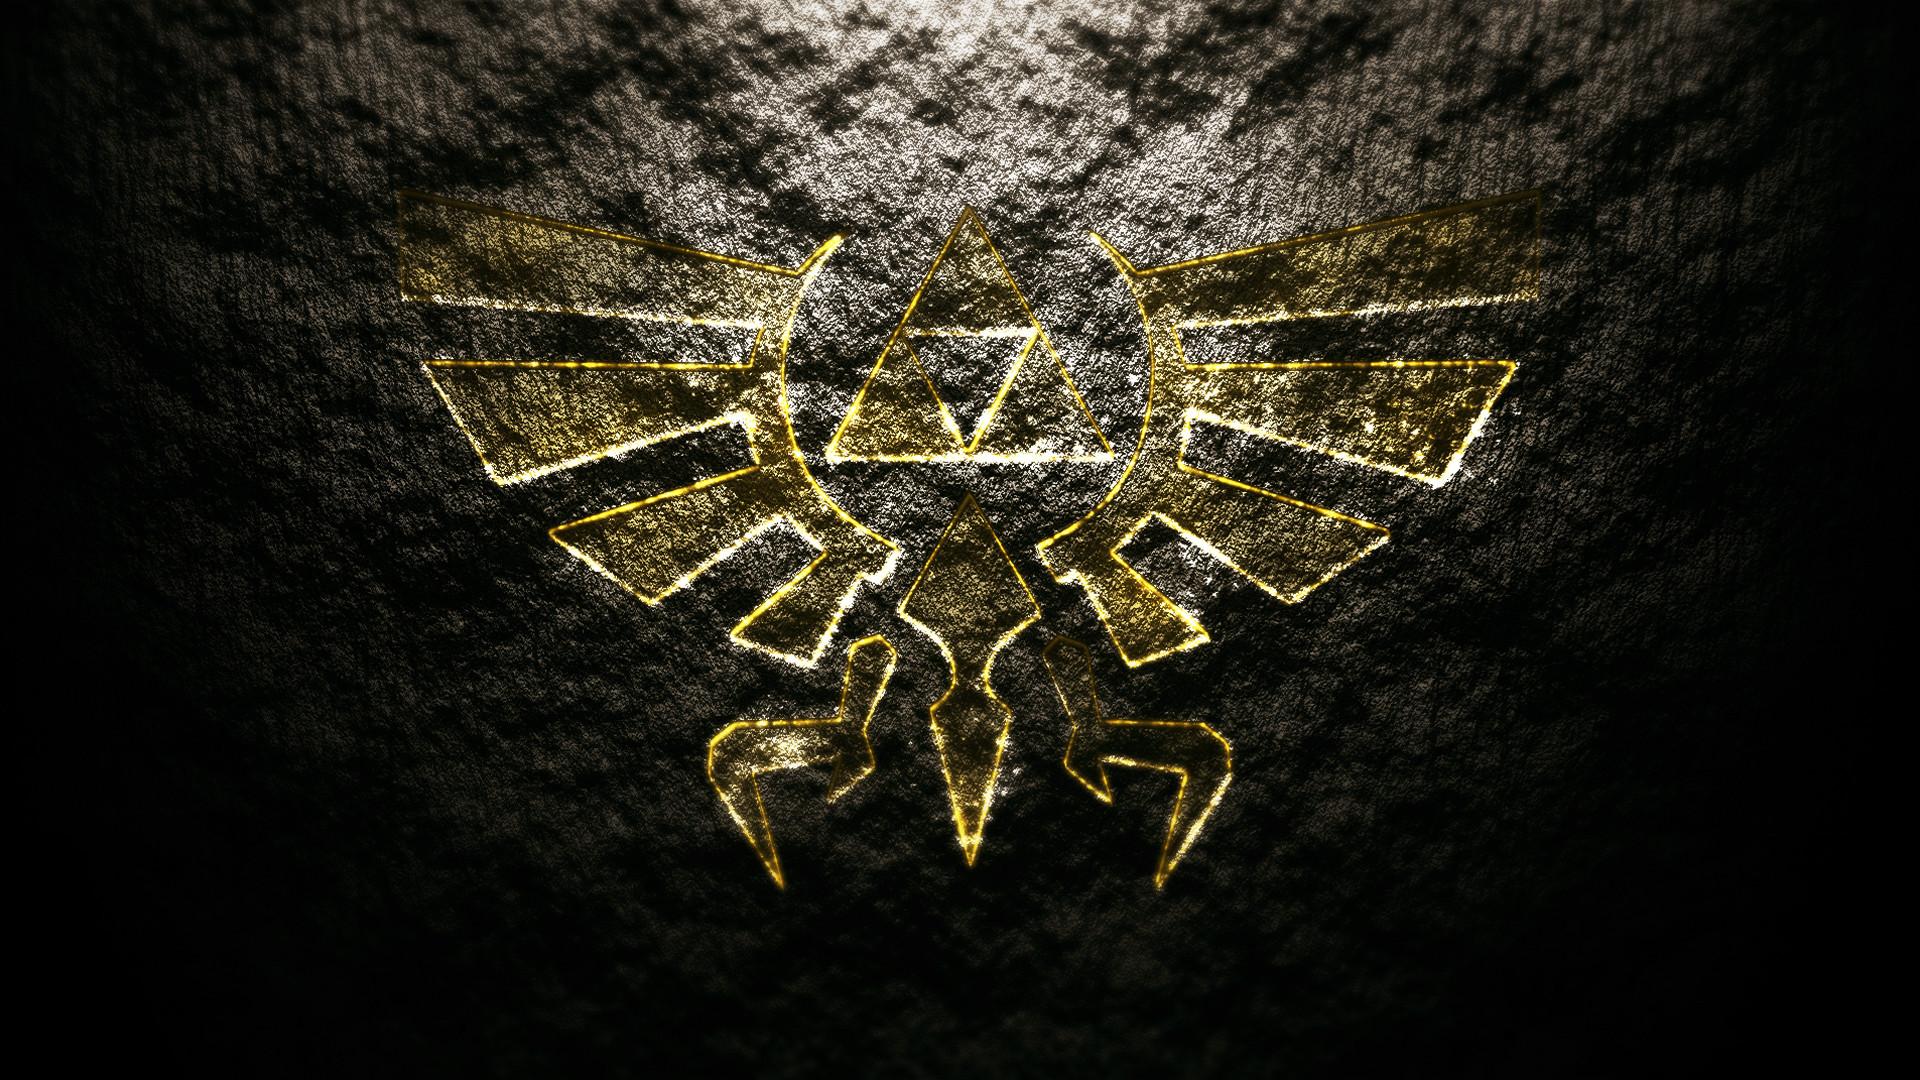 GREAT KING OF EVIL: GANONDORF